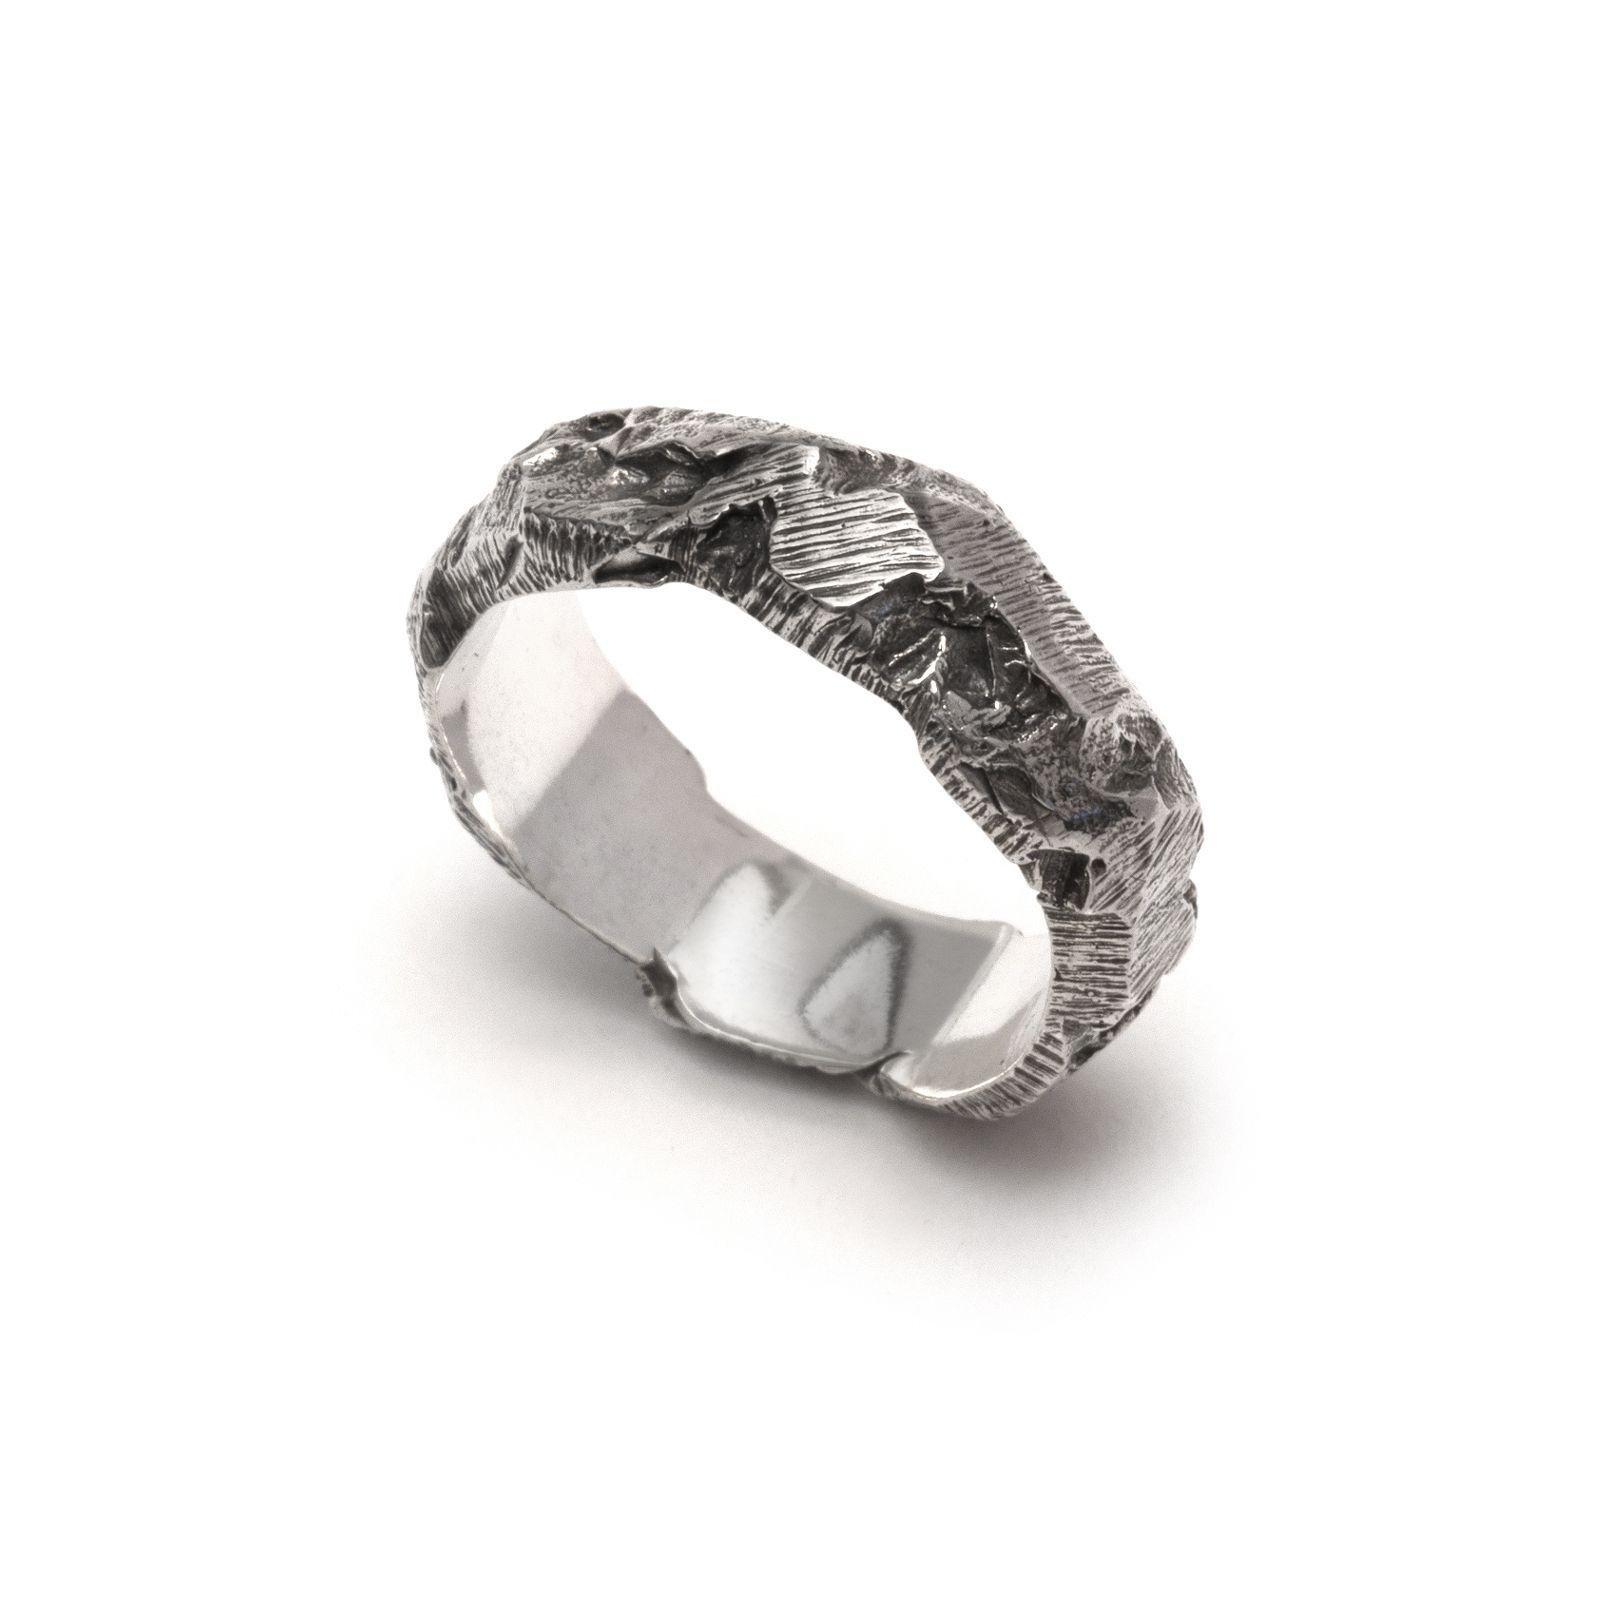 Ash Ring ALICIA HANNAH NAOMI Contemporary metal atelier